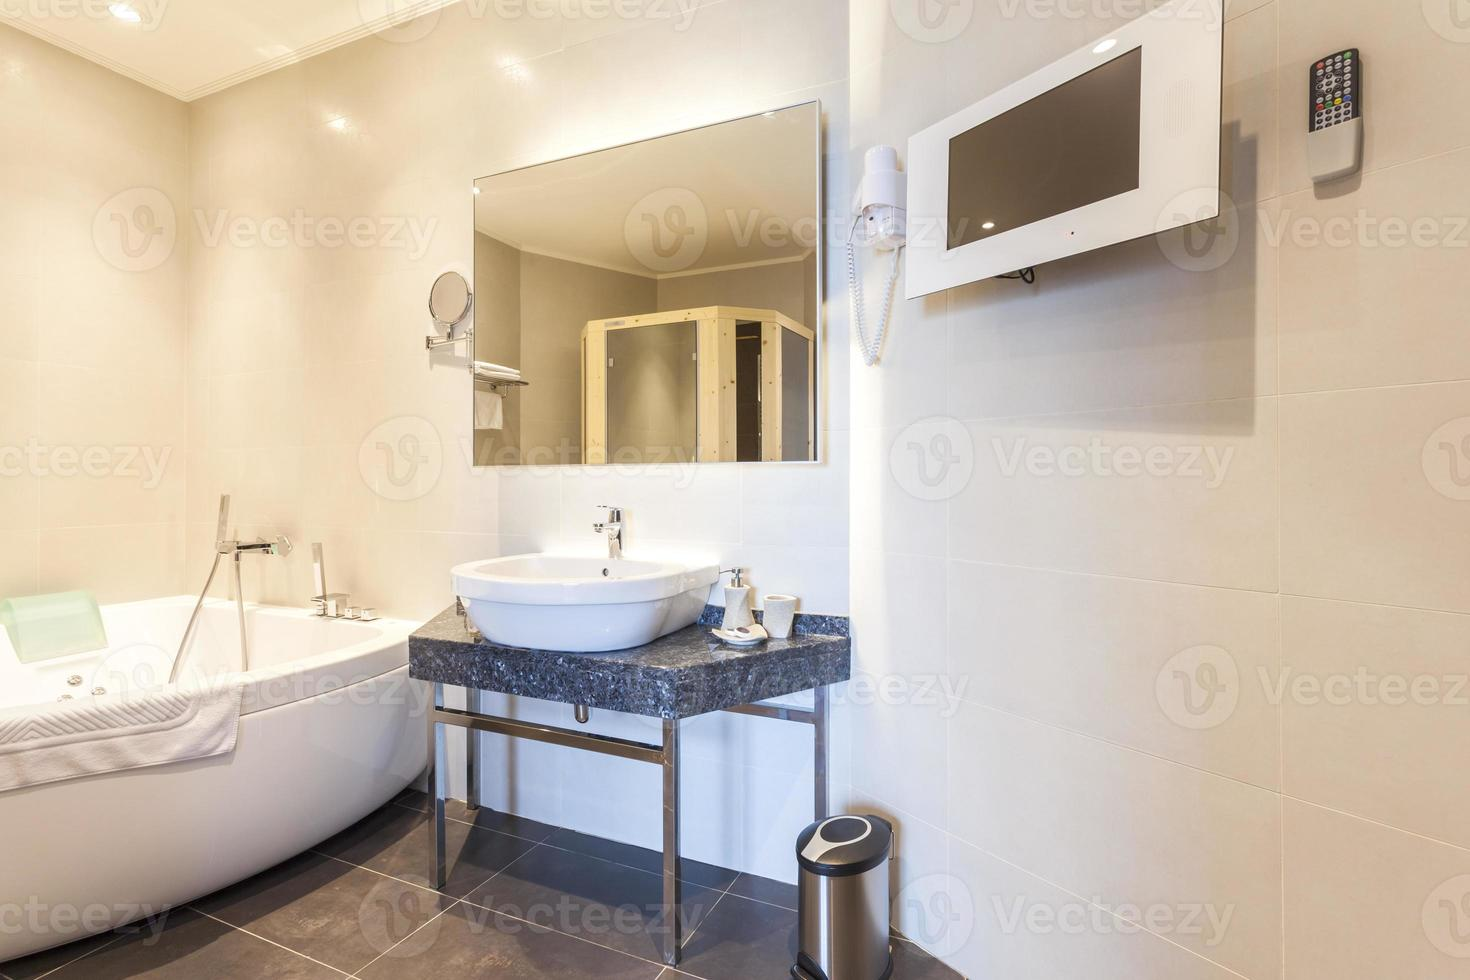 baño moderno con bañera de hidromasaje foto